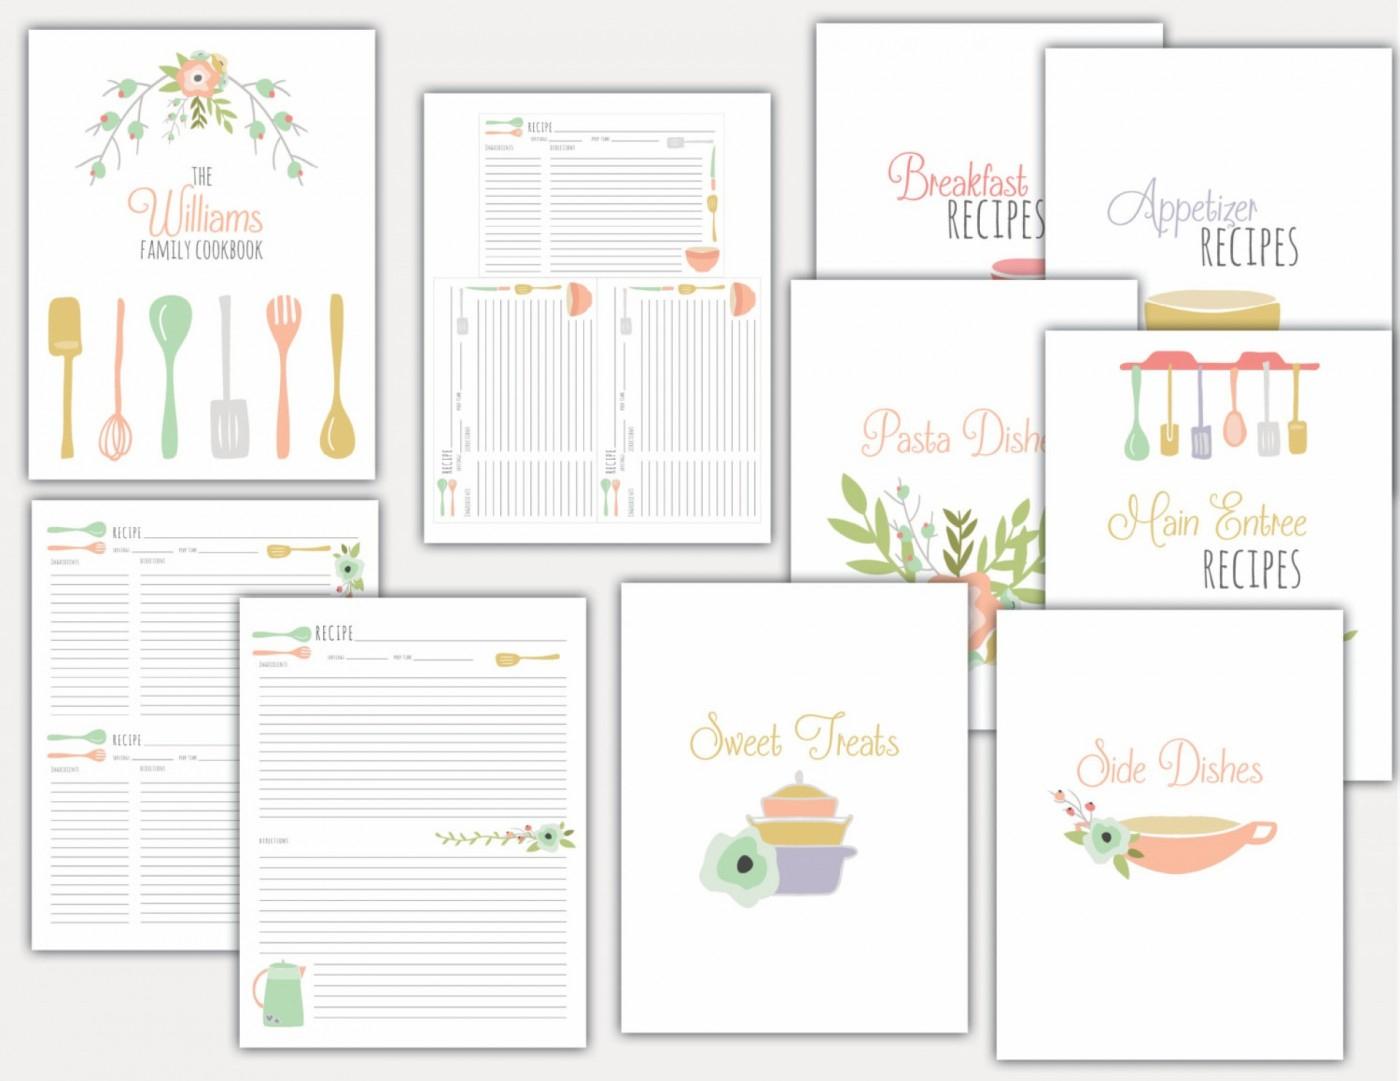 013 Free Printable Recipe Templates Card Revised Stirring Christmas - Free Printable Recipes